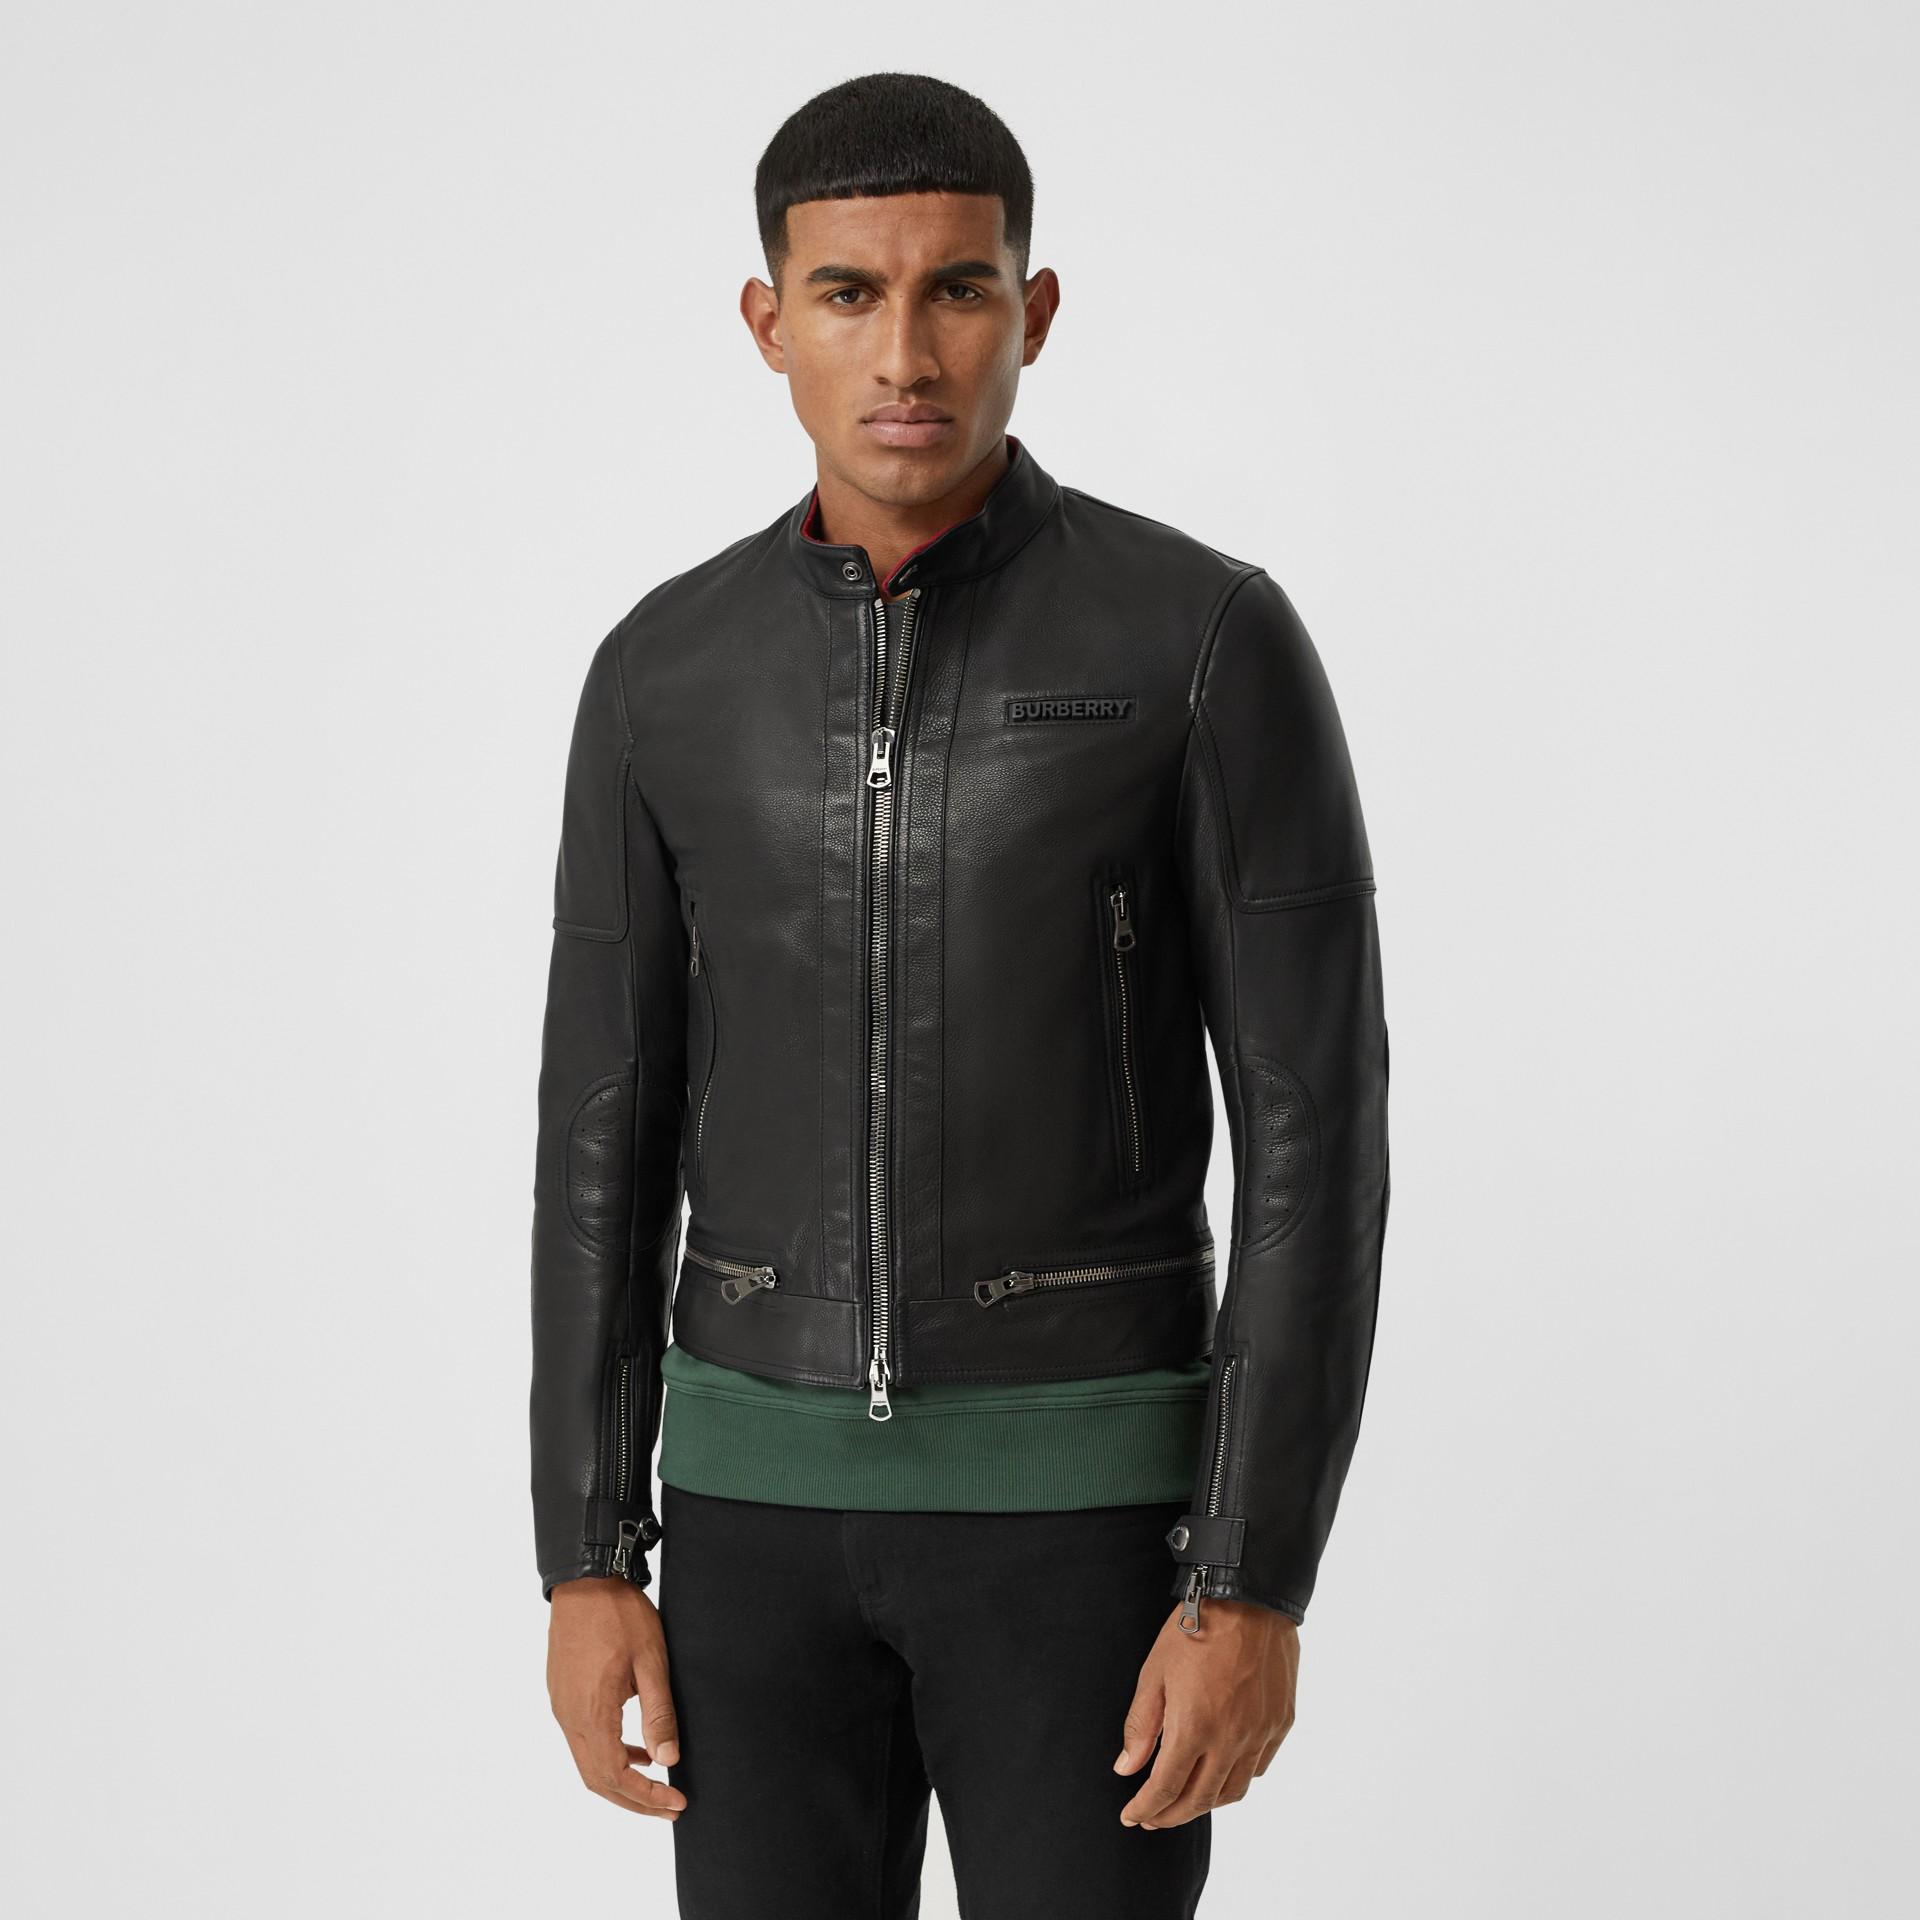 Logo Appliqué Leather Jacket in Black - Men | Burberry - gallery image 5